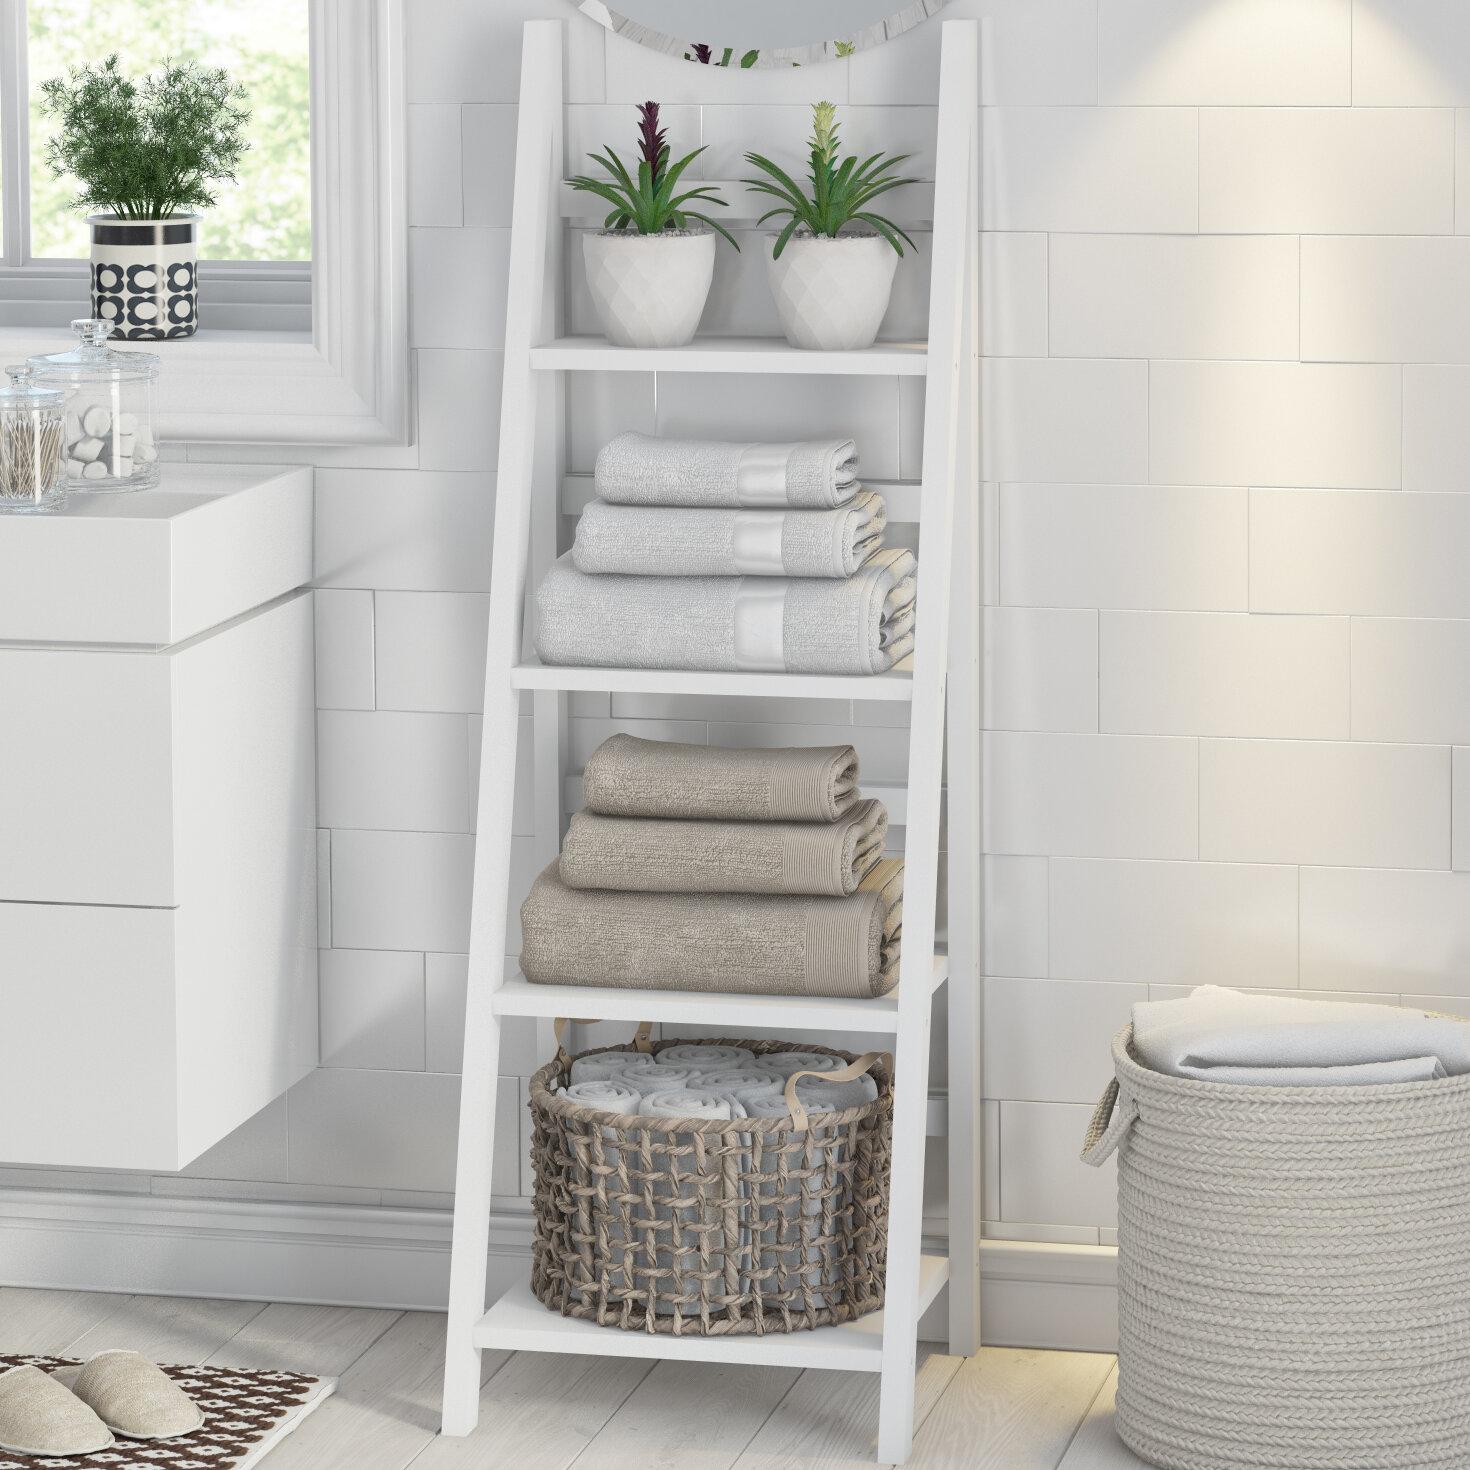 Brambly Cottage Eucptus 8 x 8cm Bathroom Shelf